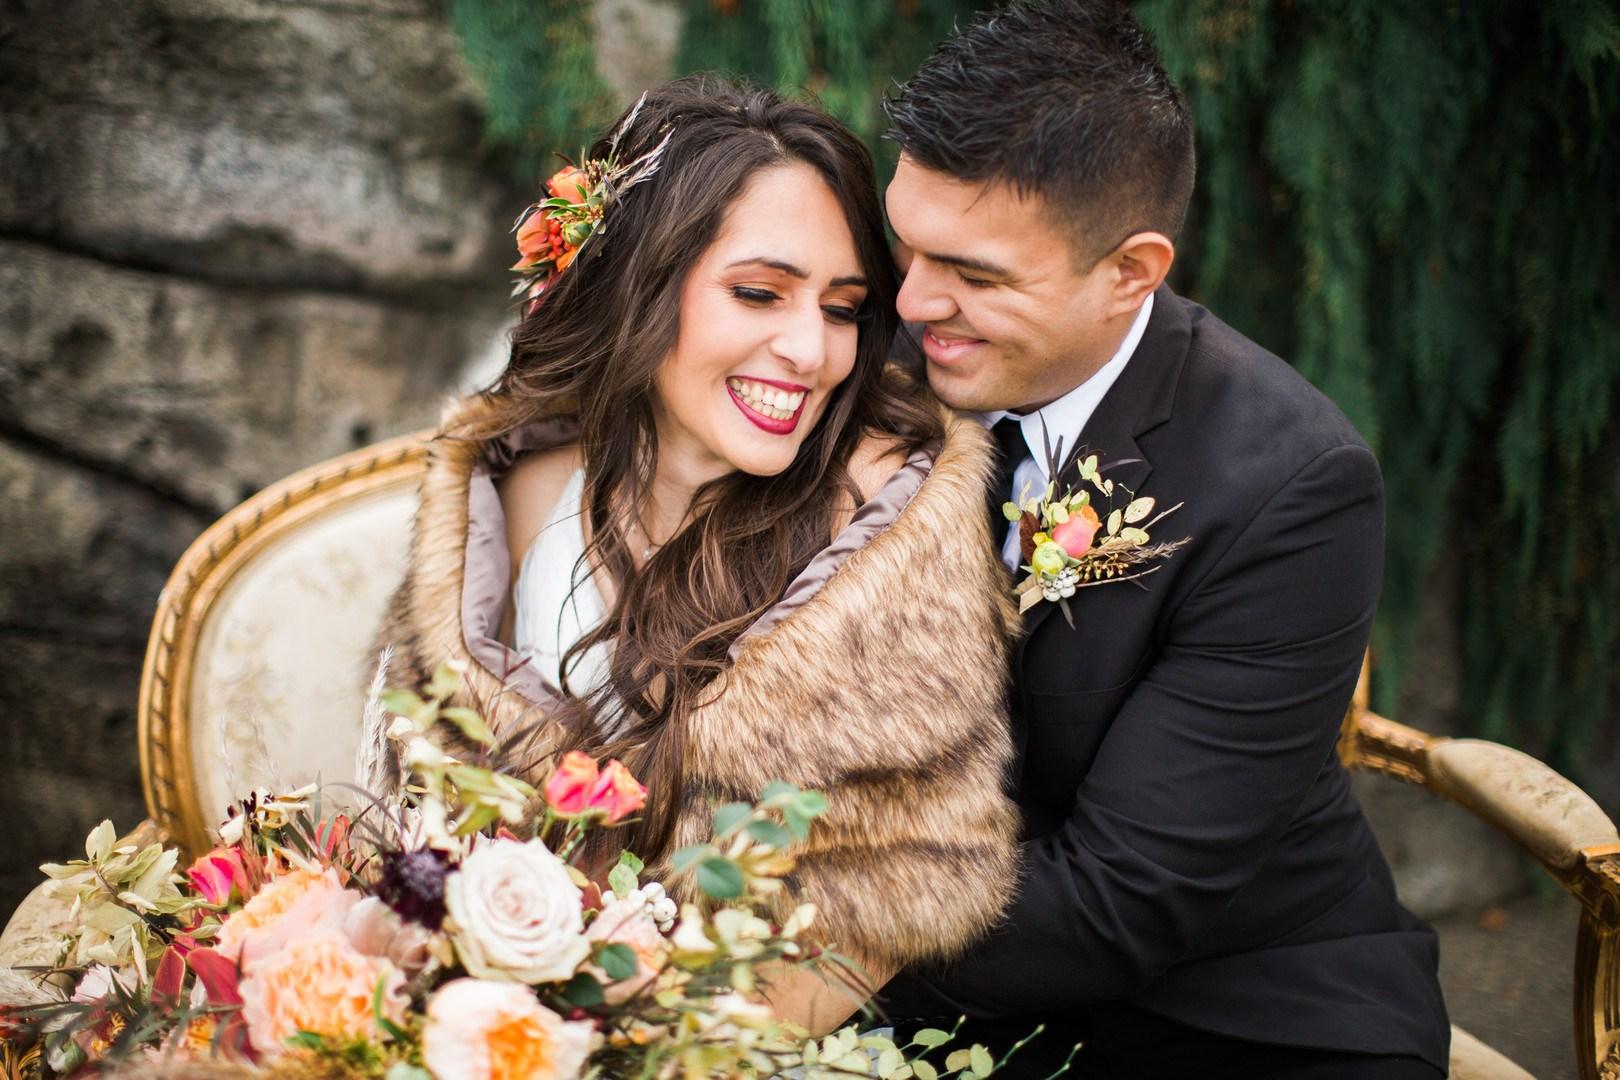 love-fern-design-studio-custom-wedding-invitations-for-the-modern-couple-modern-calligraphy-in-seattle-washington-custom-wedding-stationery-mountain-goddess-elopement